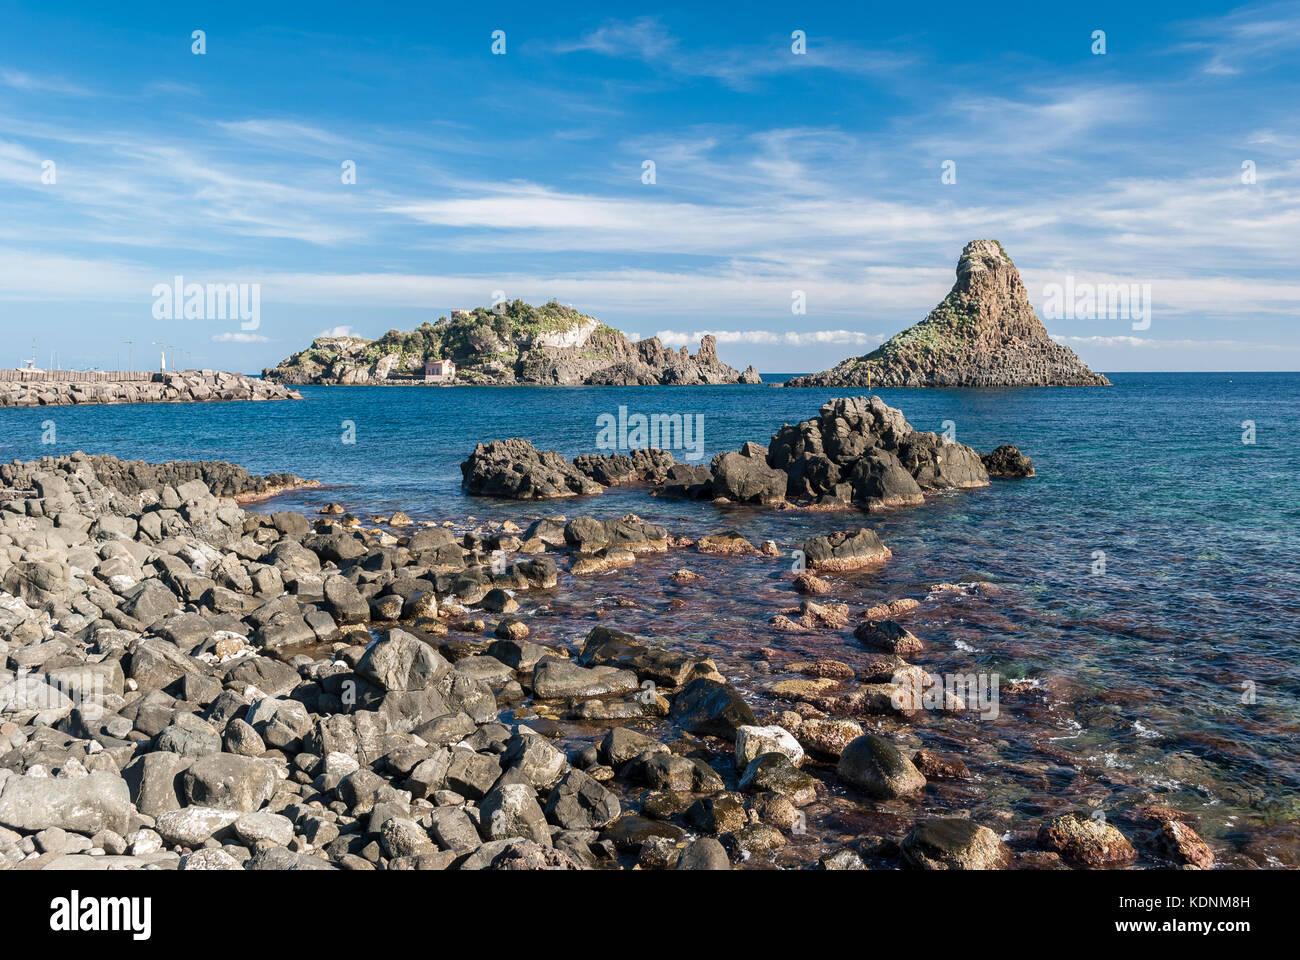 Insel Lachea und ein Meer stack, geologischen Merkmale in acitrezza (Sizilien) Stockbild